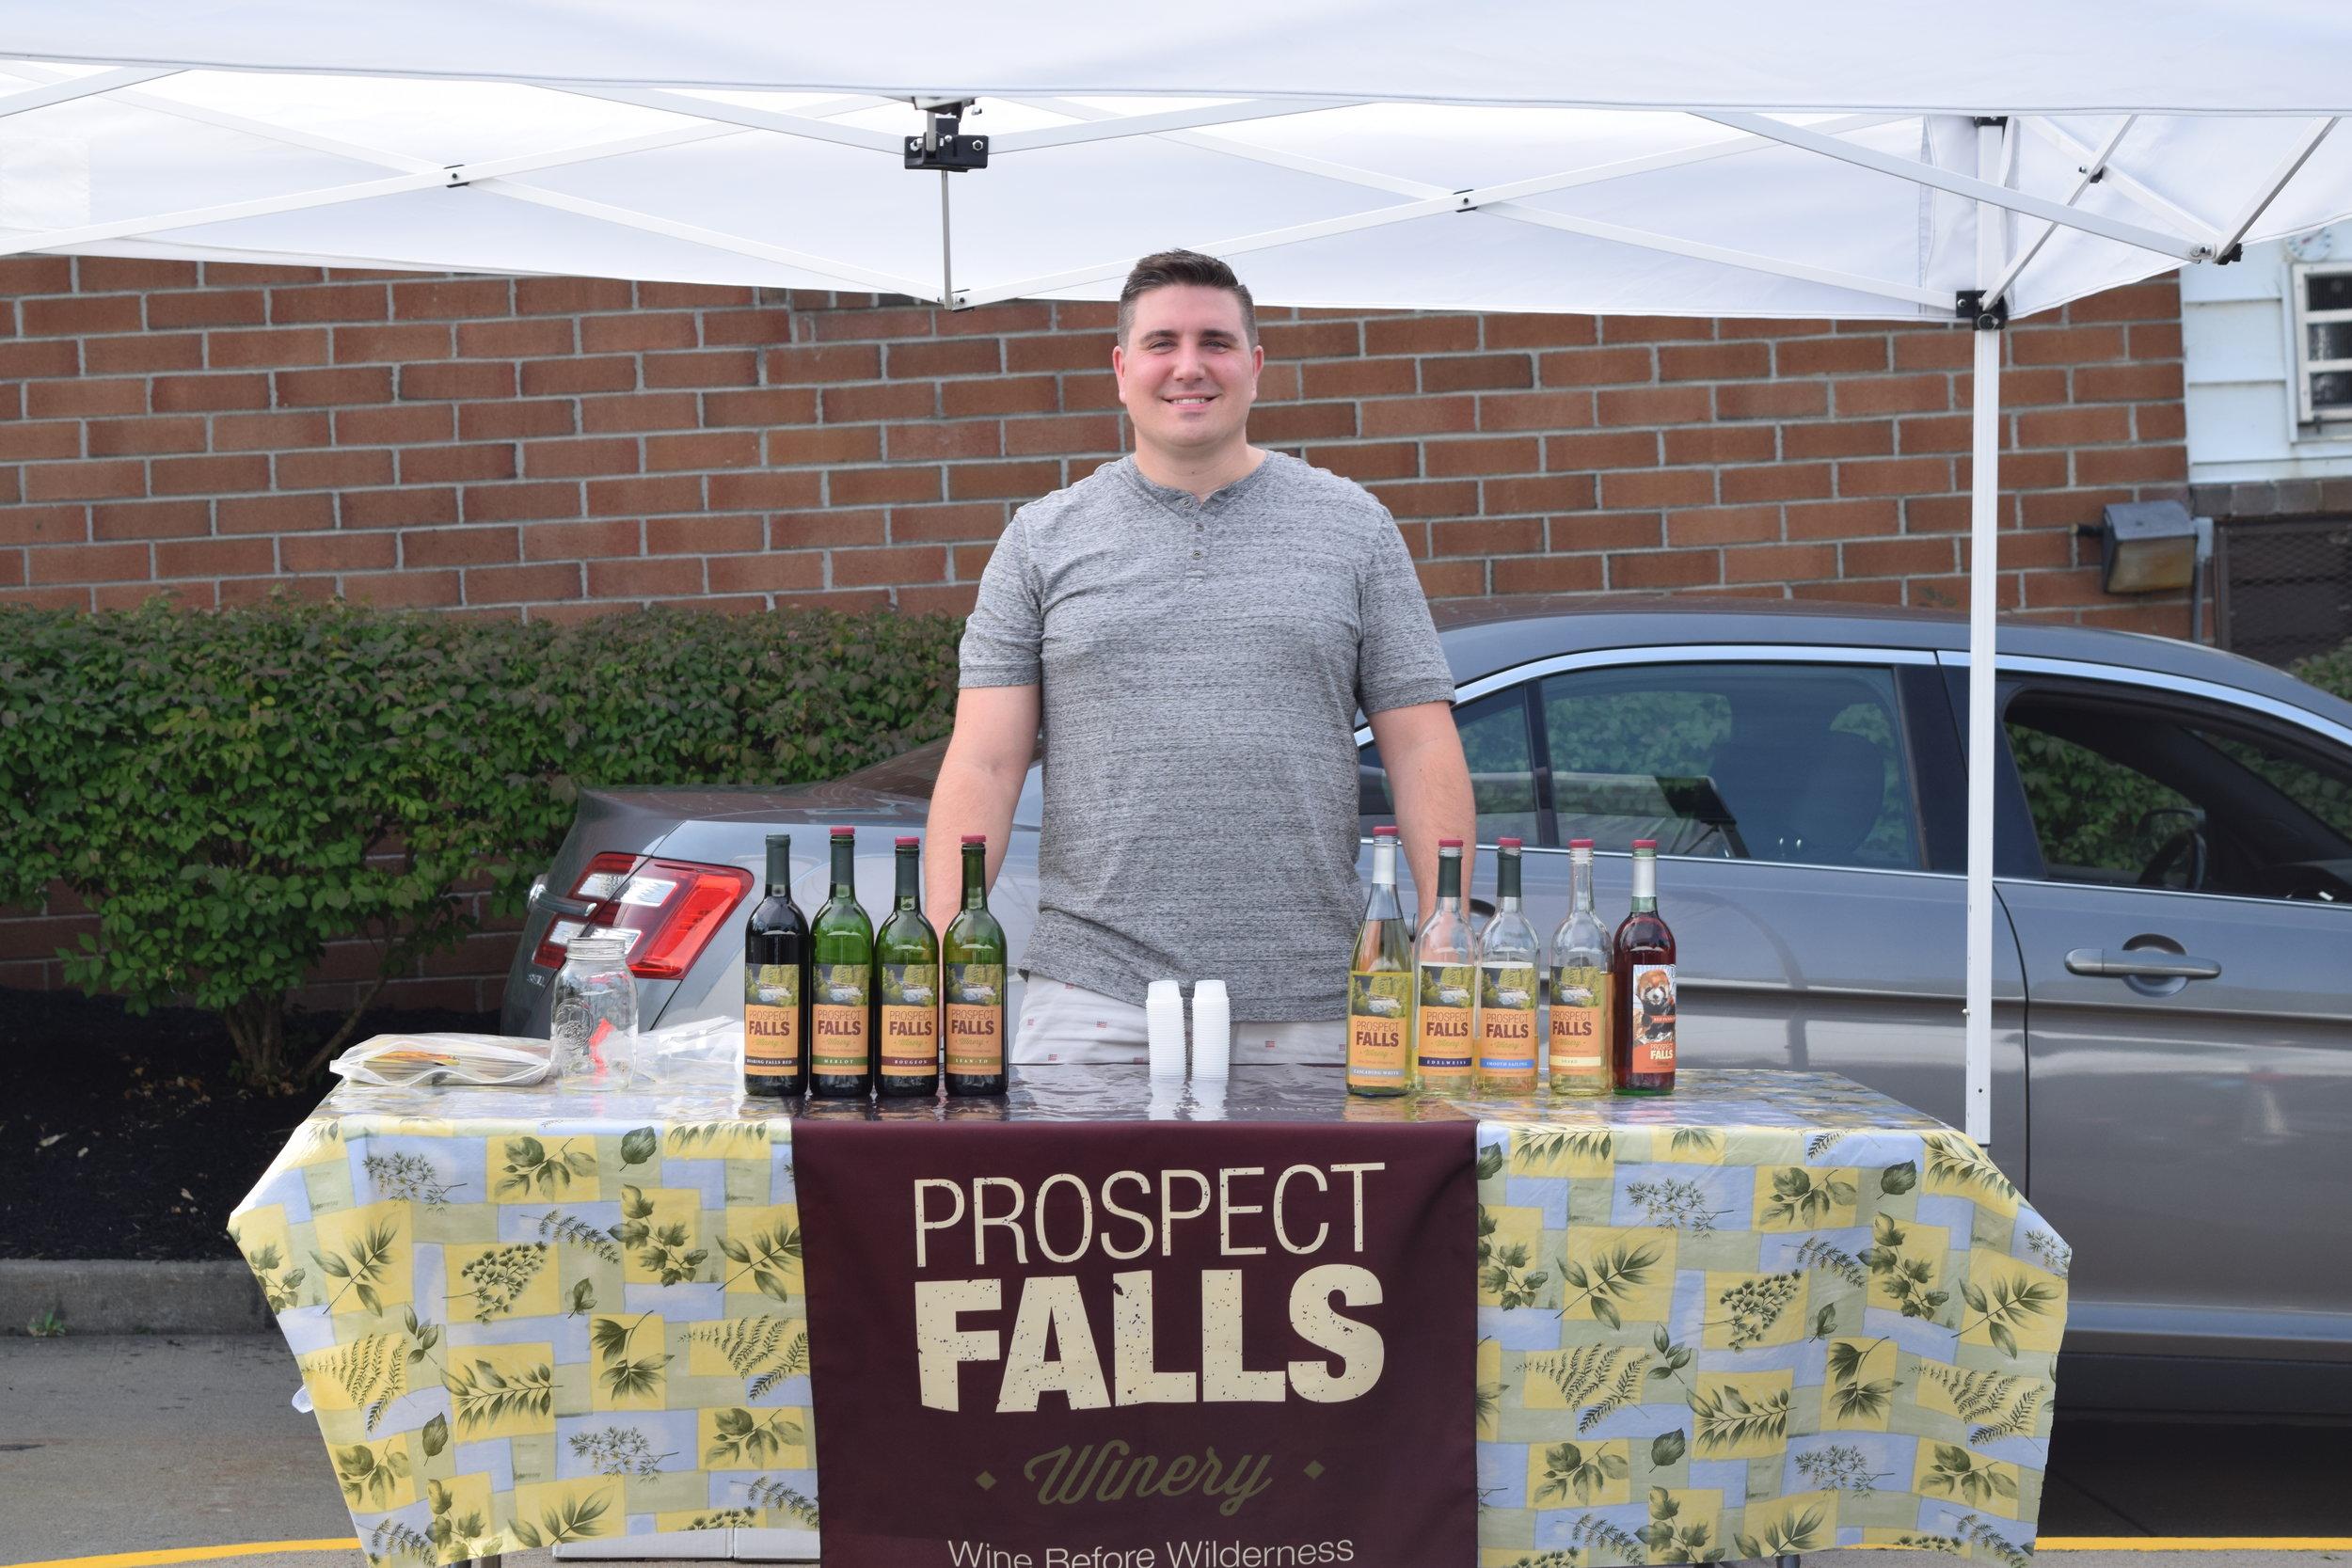 Summer-Fest 2017 Prospect Falls Winery Free Tasting and Selling Bottles of Wine.JPG